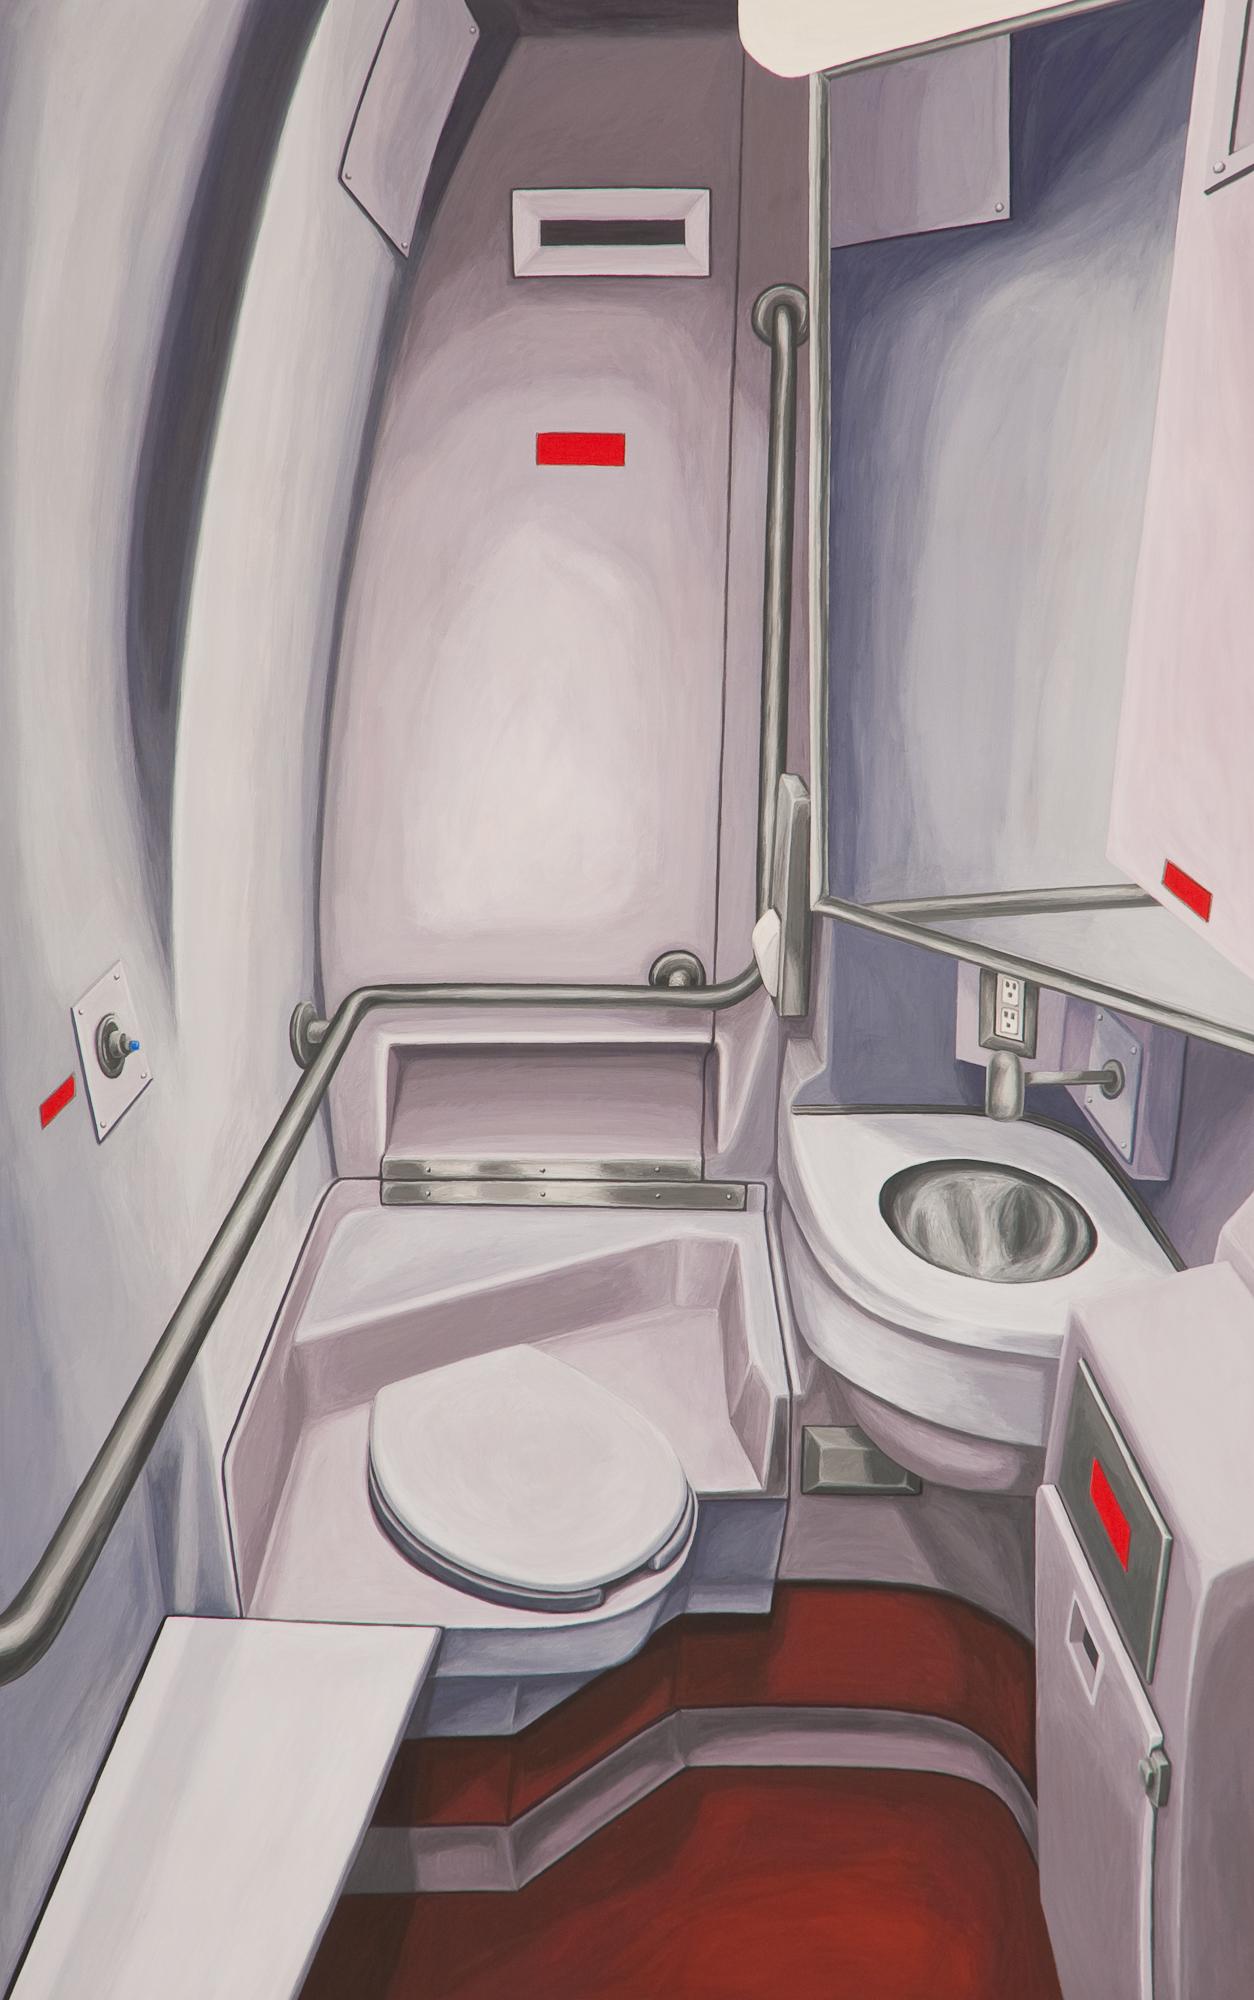 Bathroom #4, 2010, Gouache on Paper, 15 X 22 inches